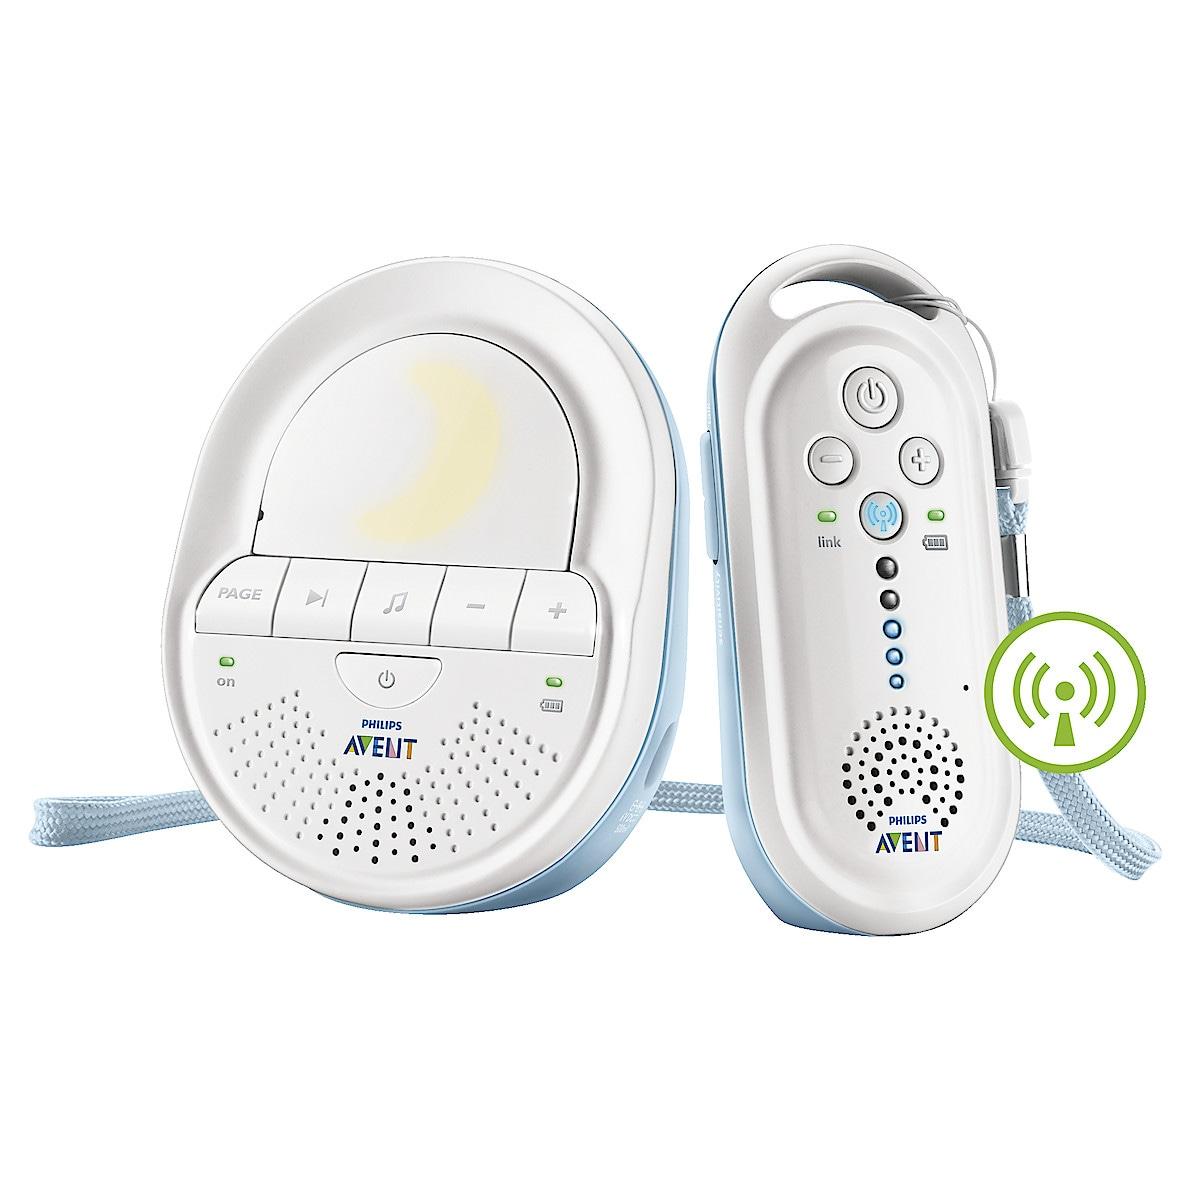 Philips AVENT SCD505 babycall